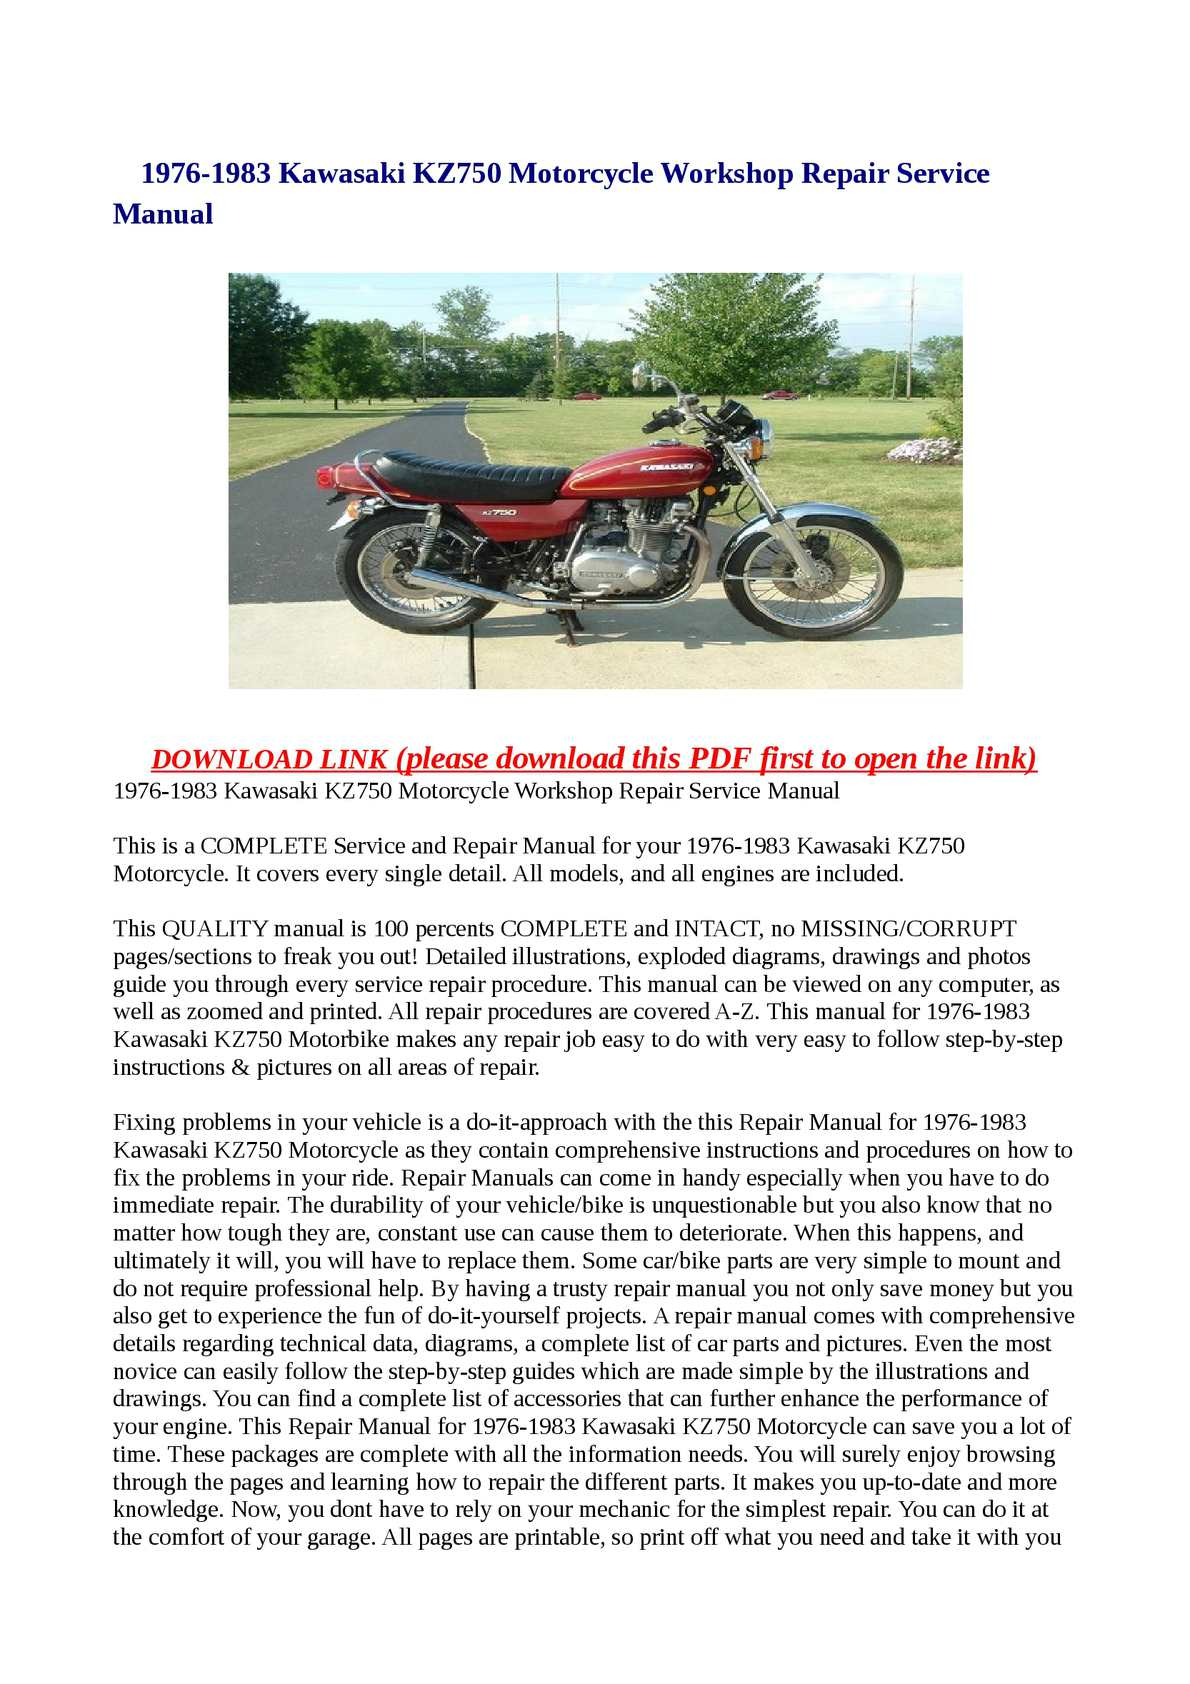 Calamo 1976 1983 Kawasaki Kz750 Motorcycle Workshop Repair 19781979 Complete Wiring Diagram All About Service Manual